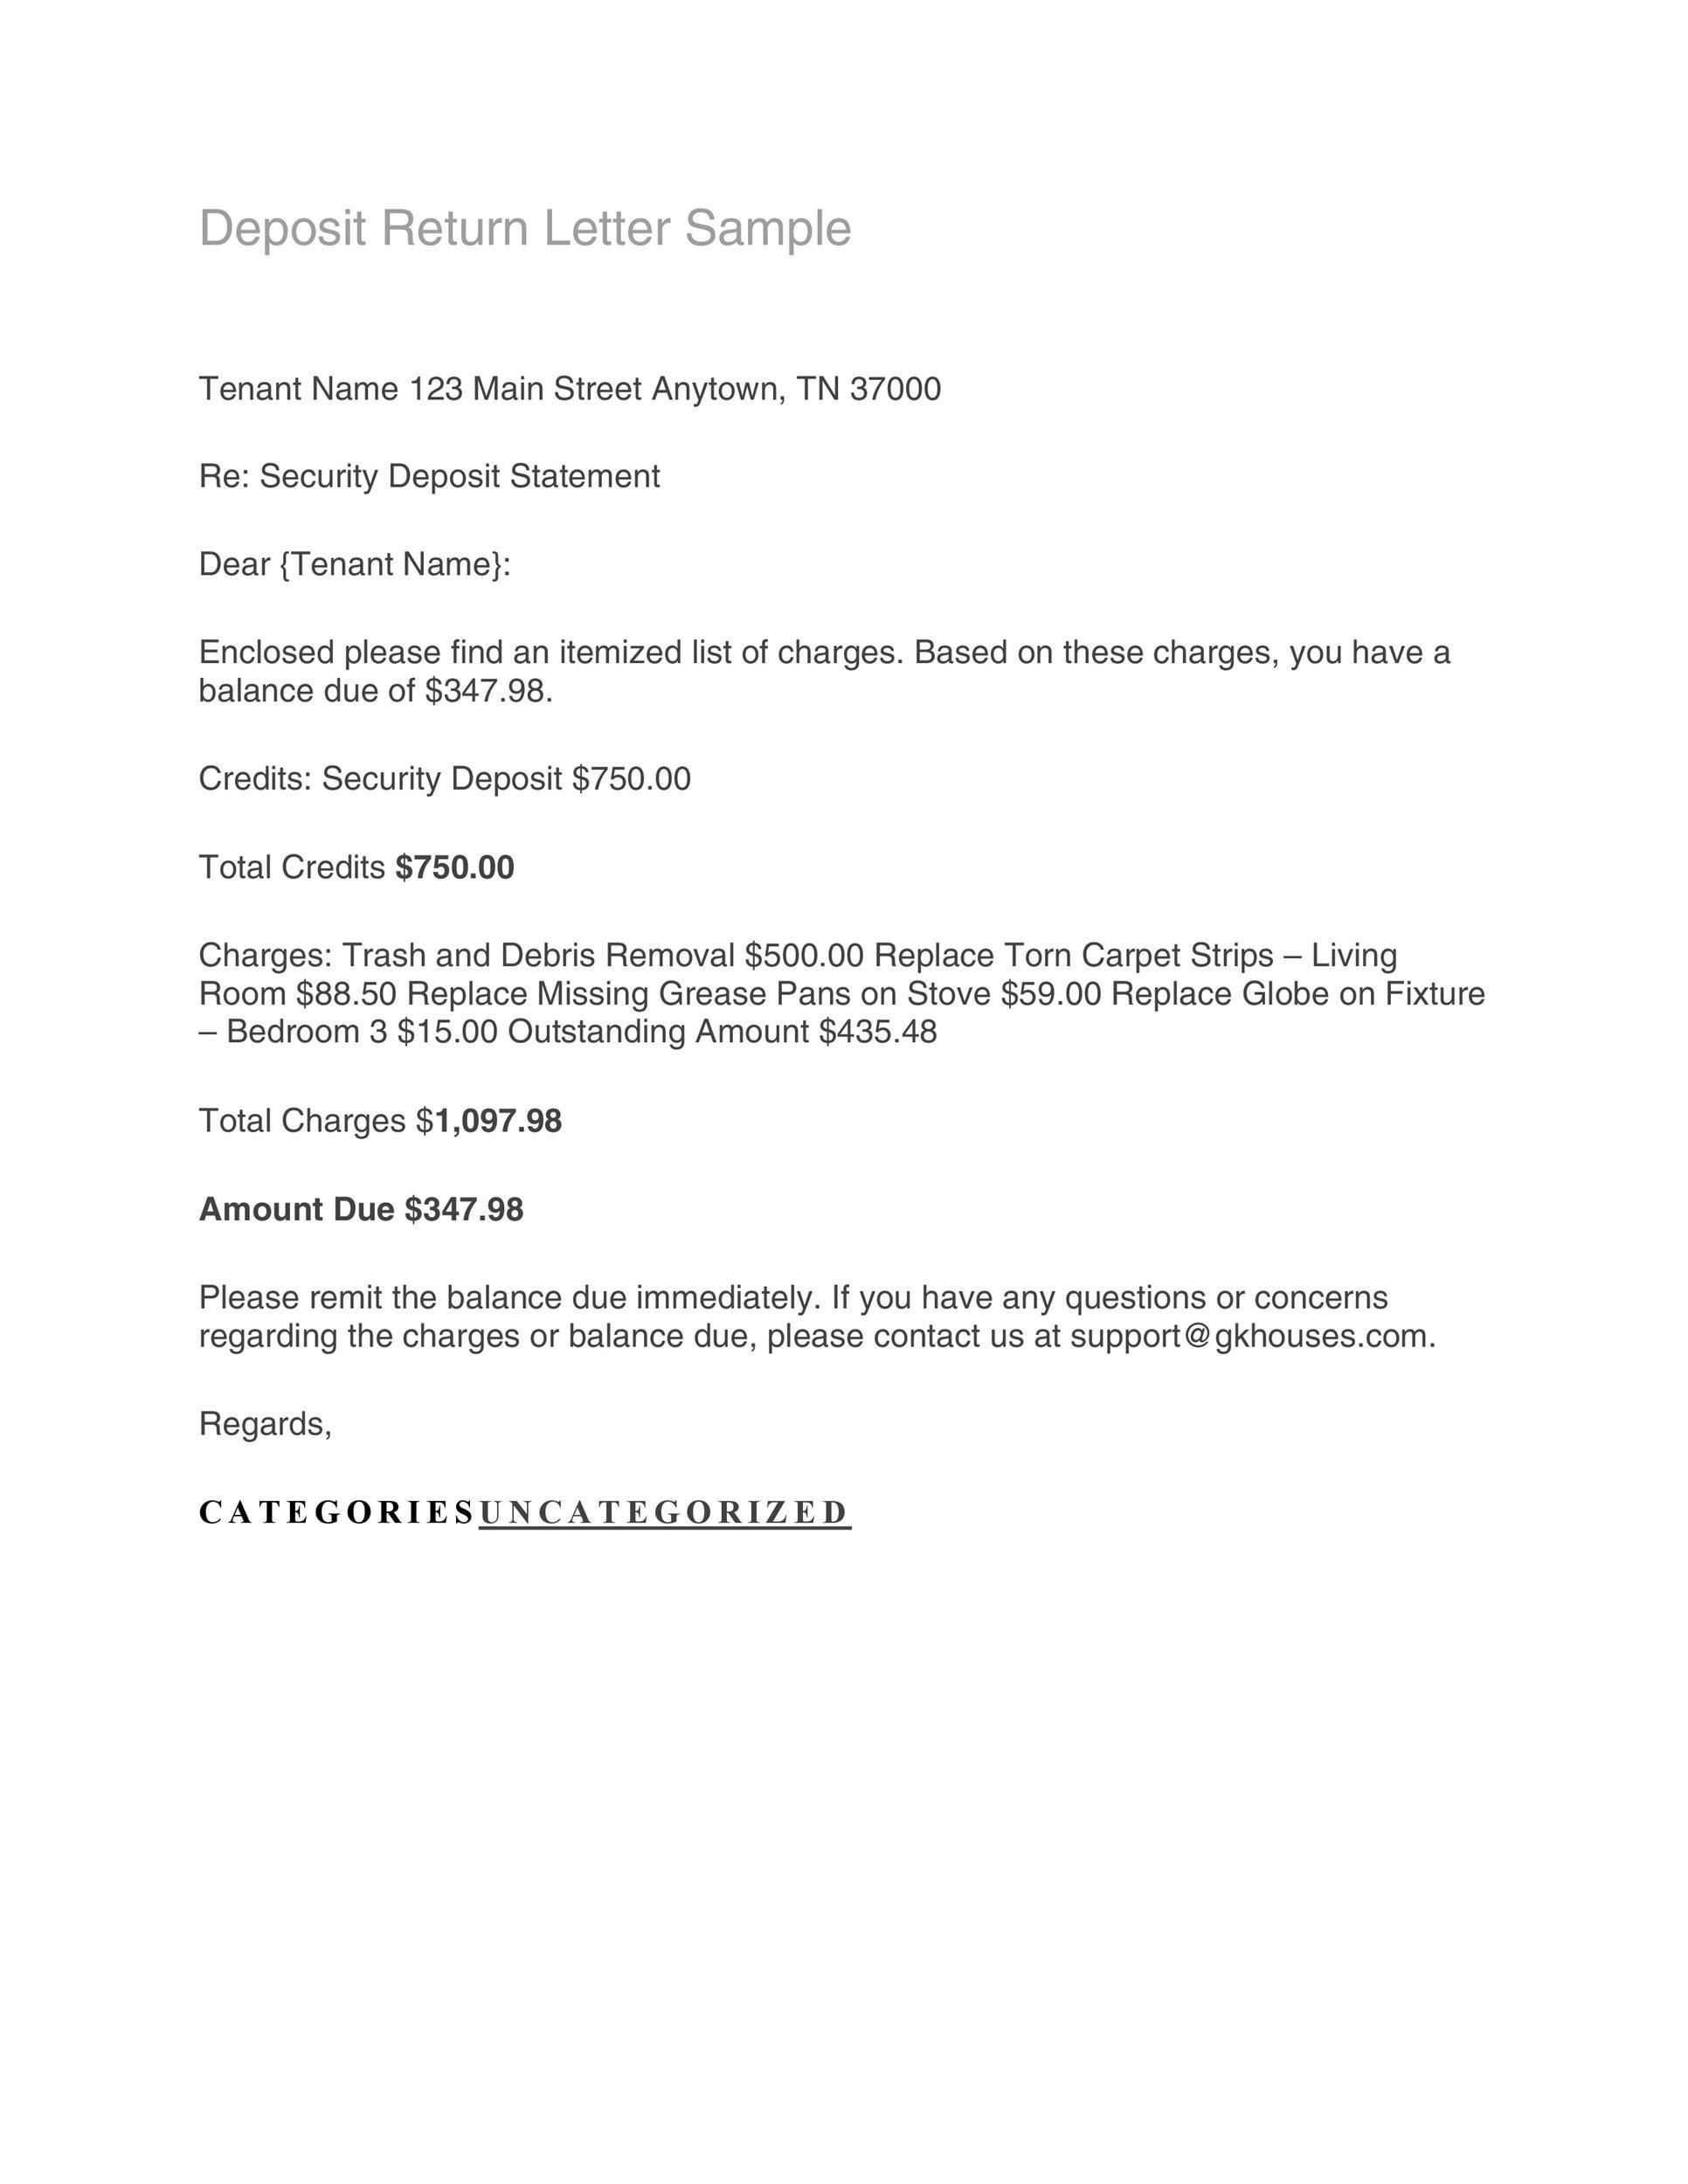 Free security deposit return letter 05